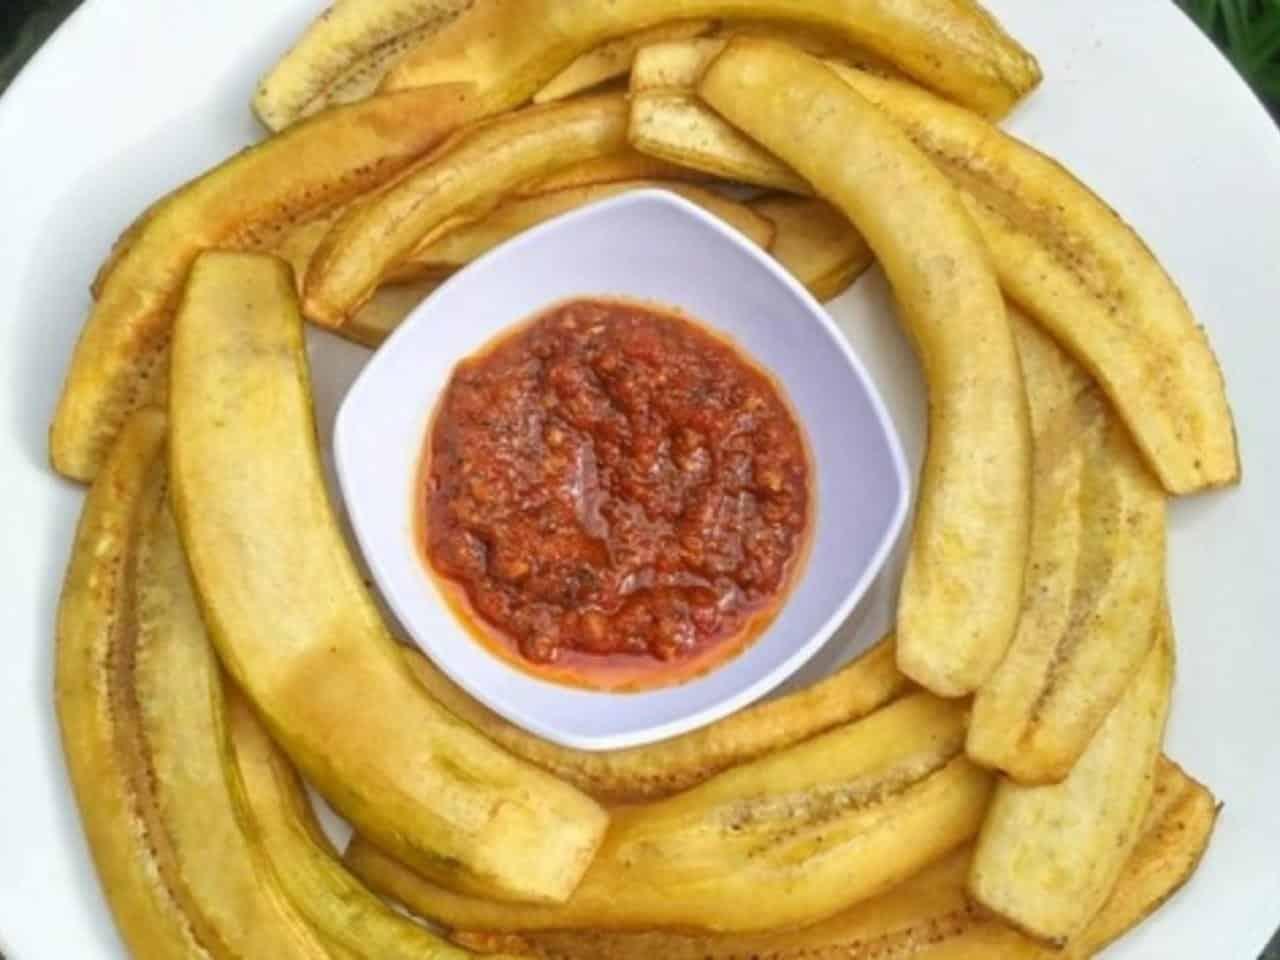 gambar makanan khas manado Pisang Goroho